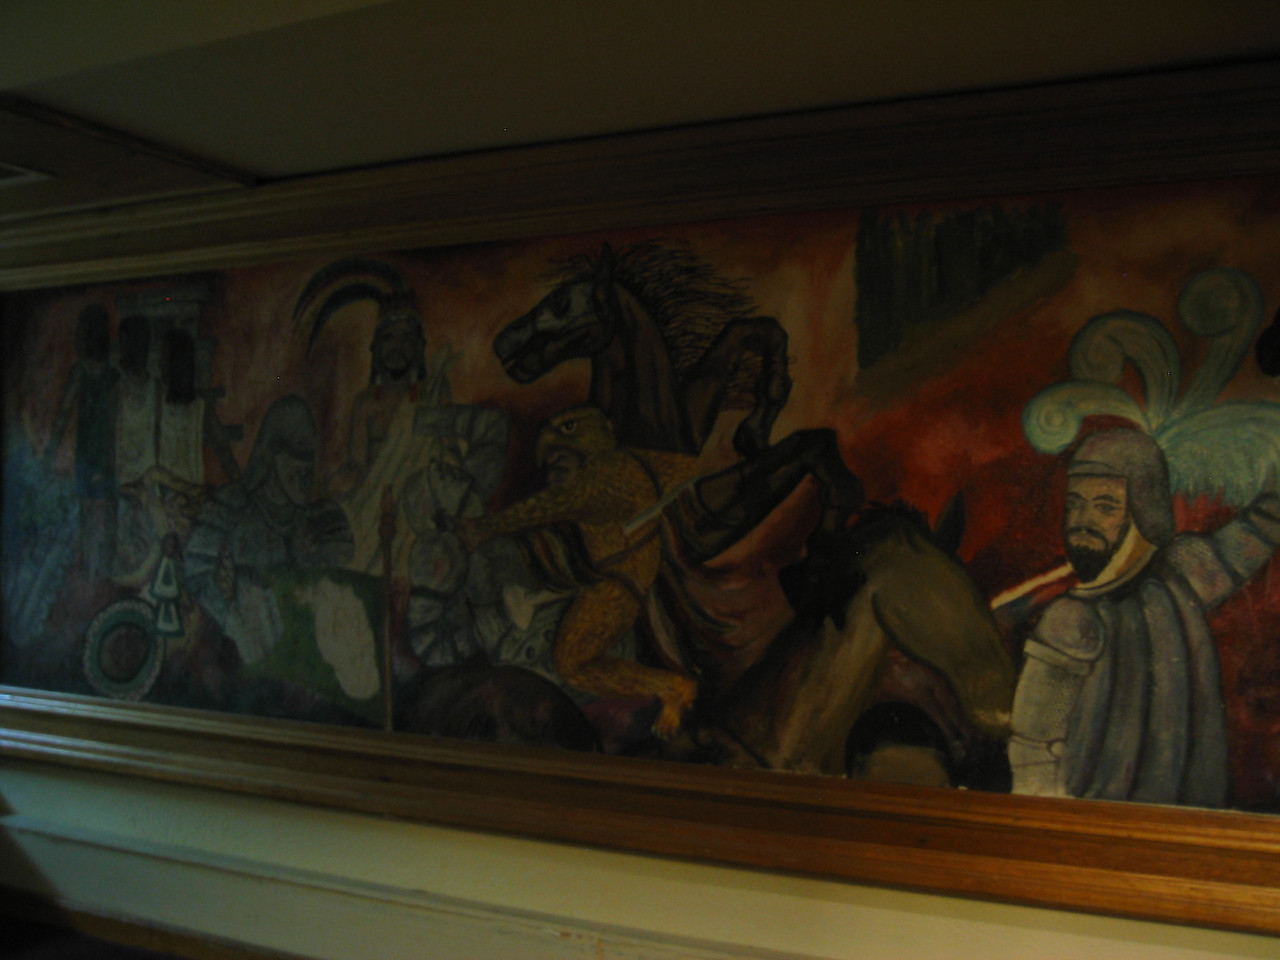 2004 05 28 Friday - Hotel San Nicholas Mayan artwork 3